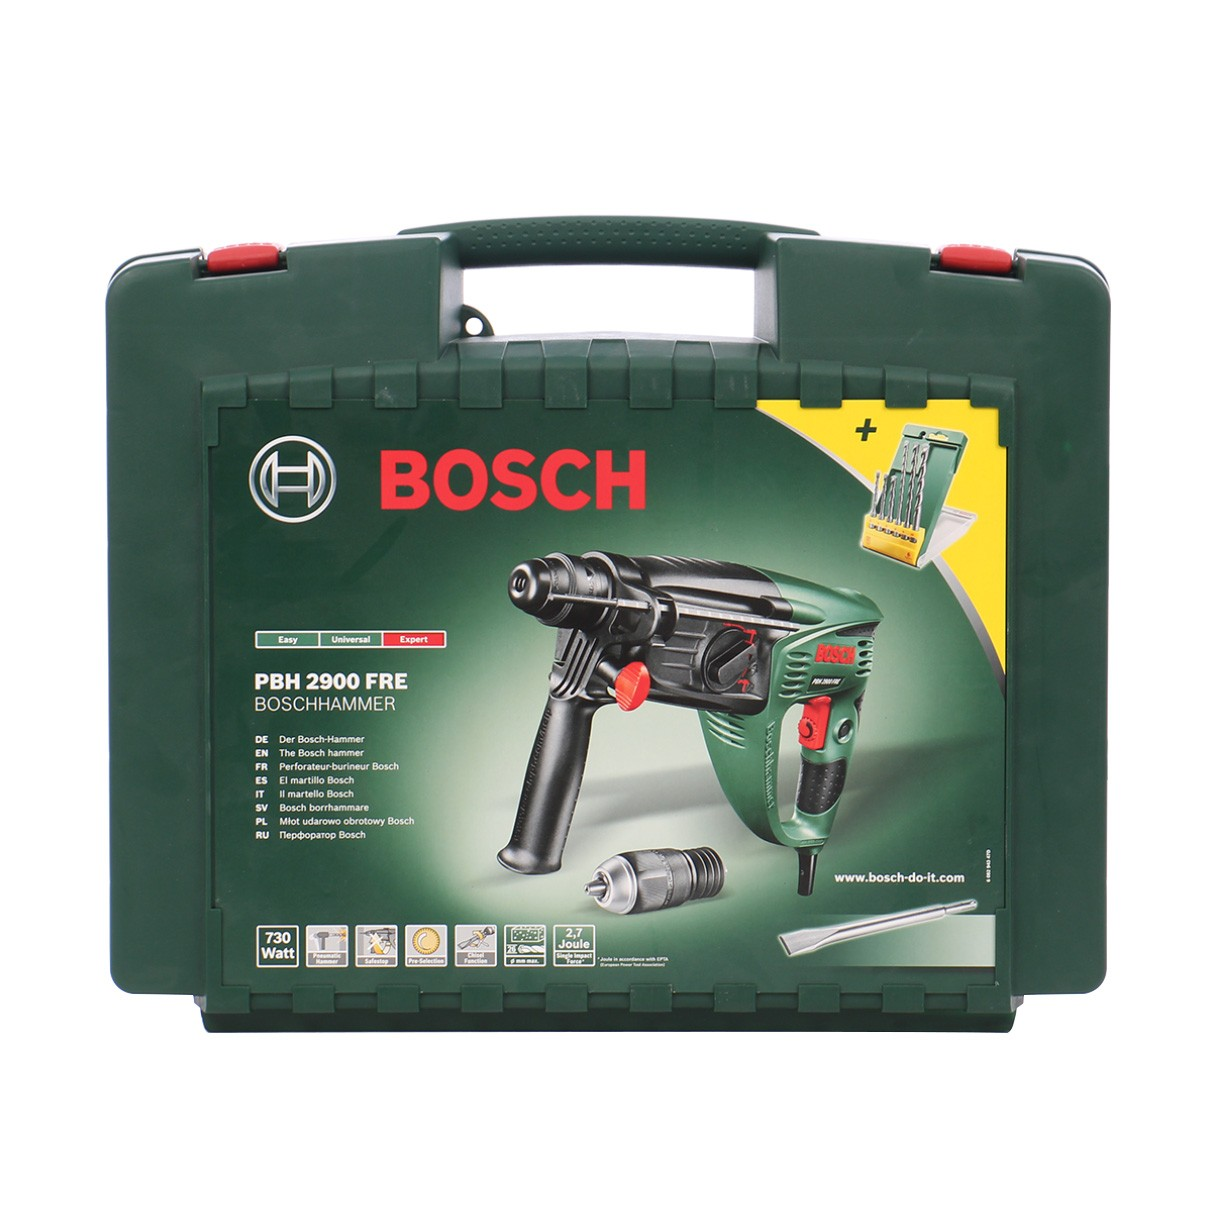 Ciocan rotopercutor cu 3 functii Bosch PBH 2900  730 W + accesorii